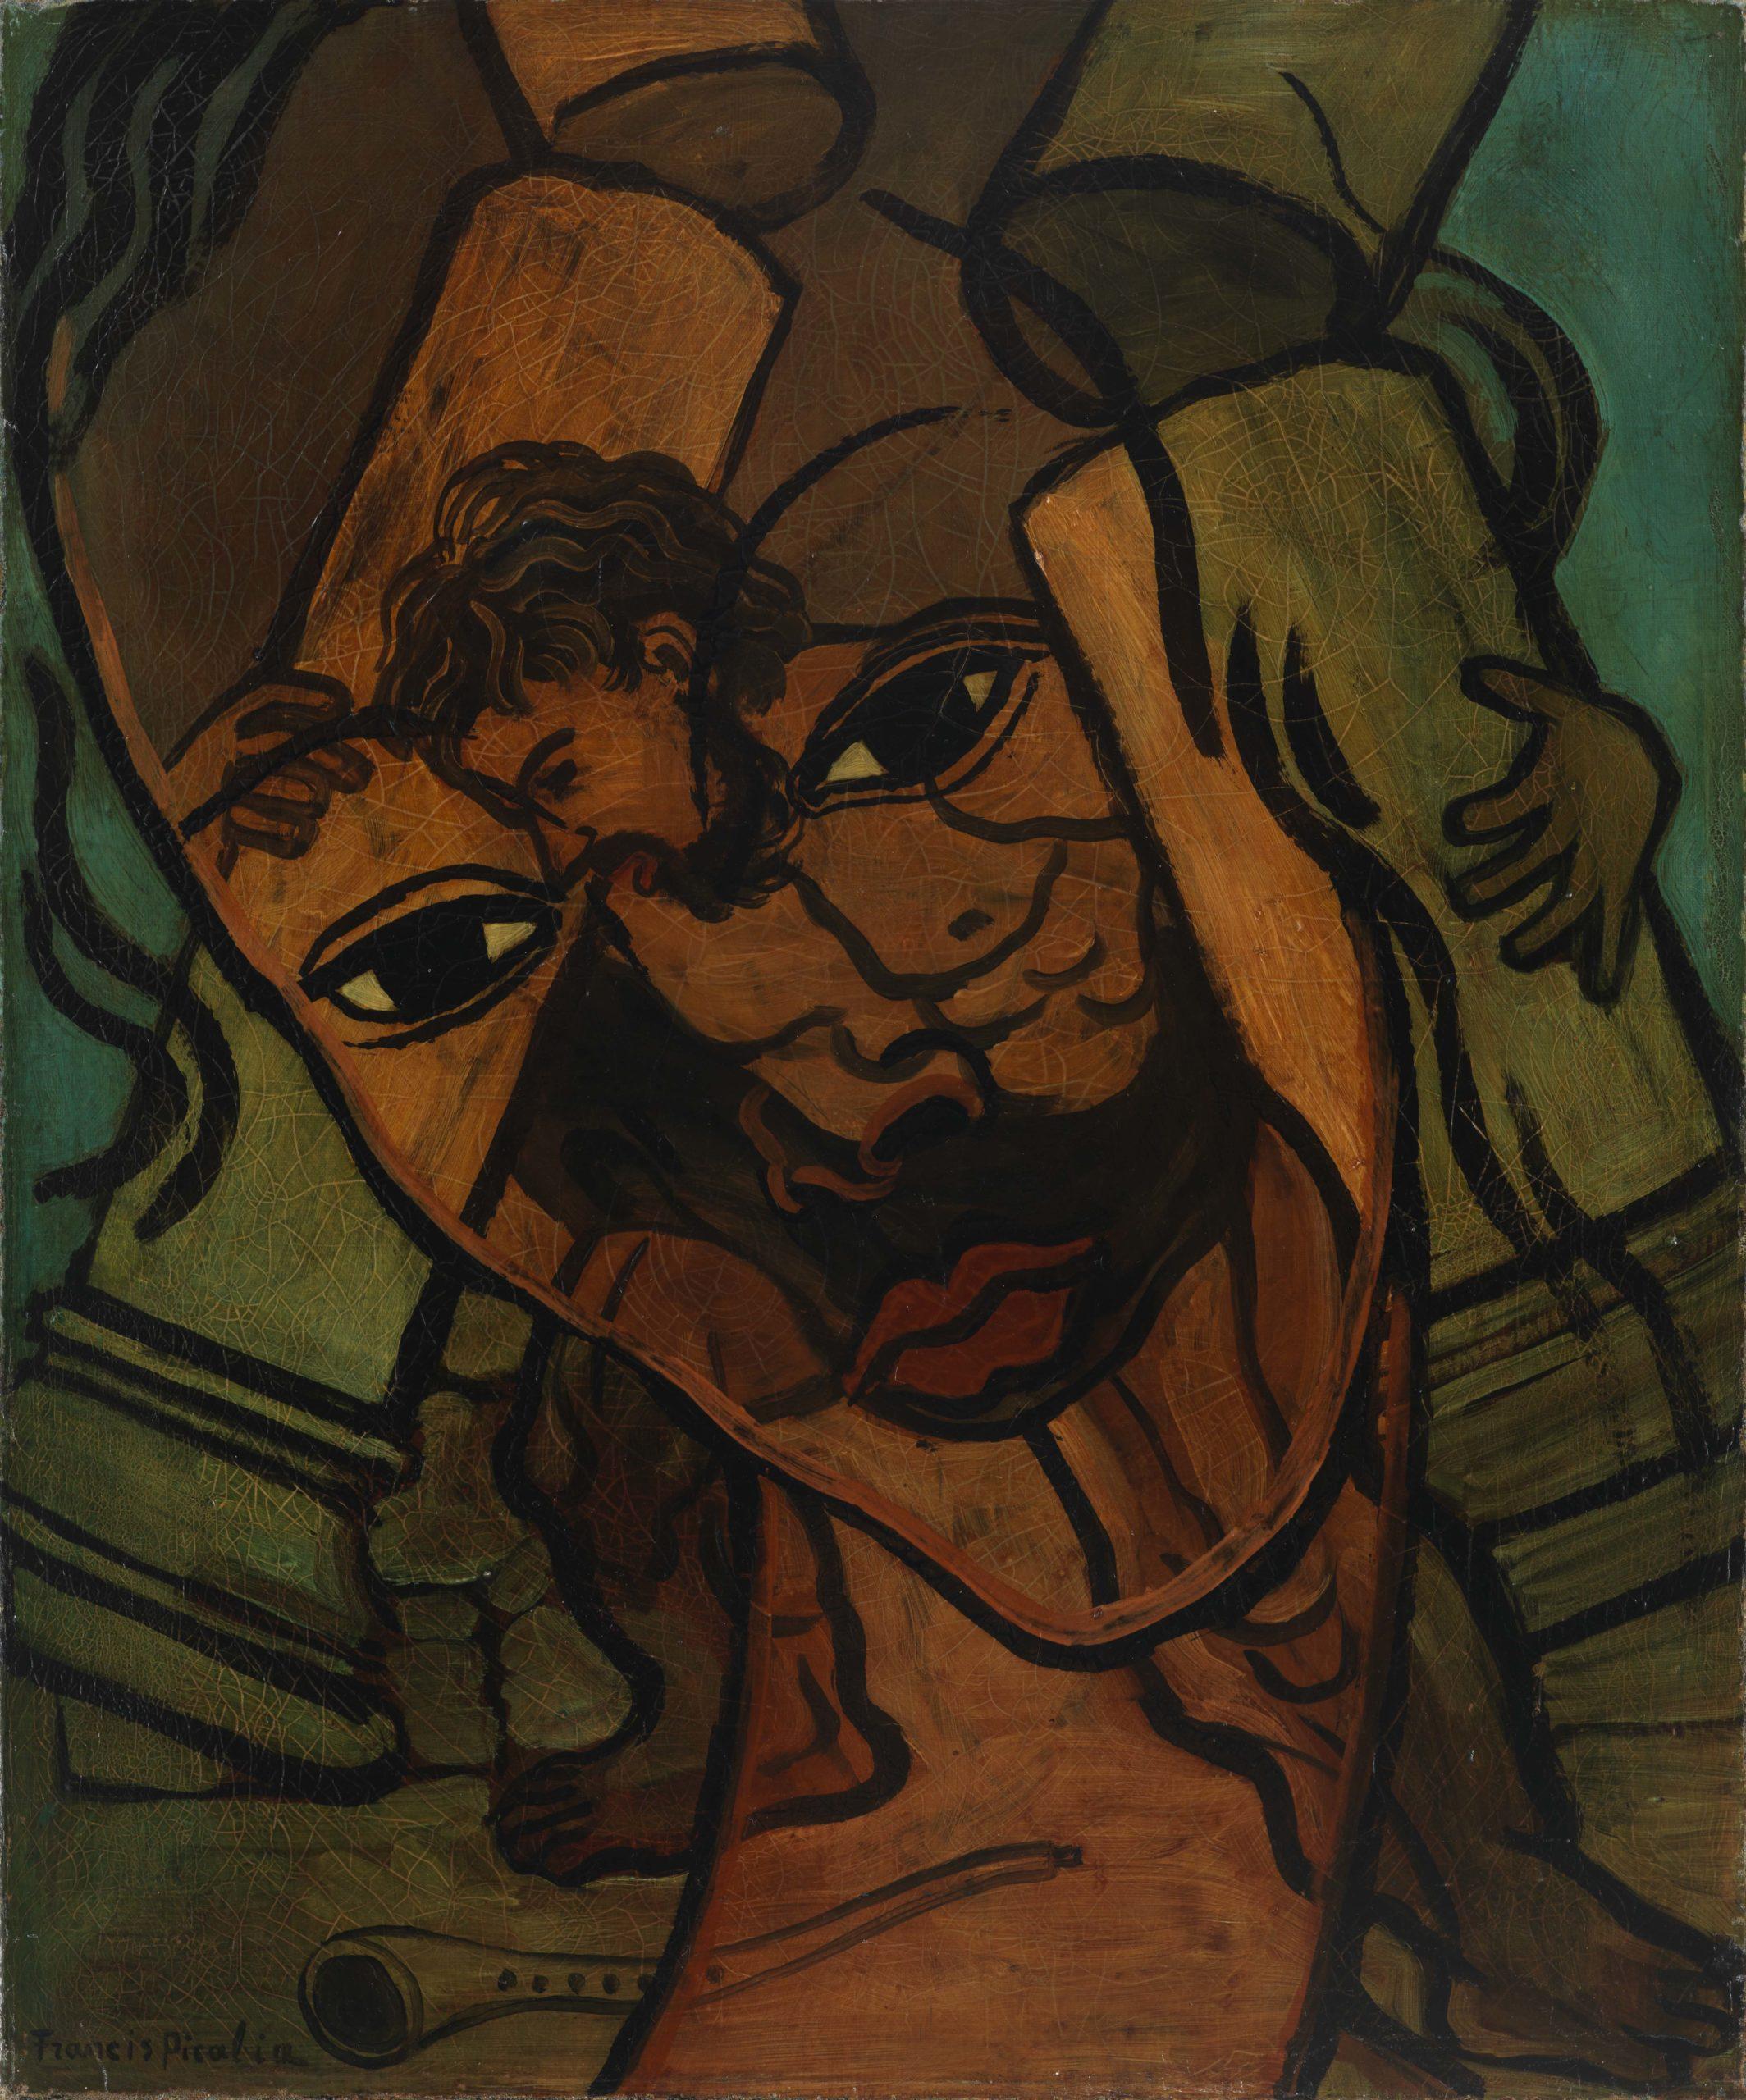 Francis Picabia, Trasparence, Samson et Dalila, 1935-37